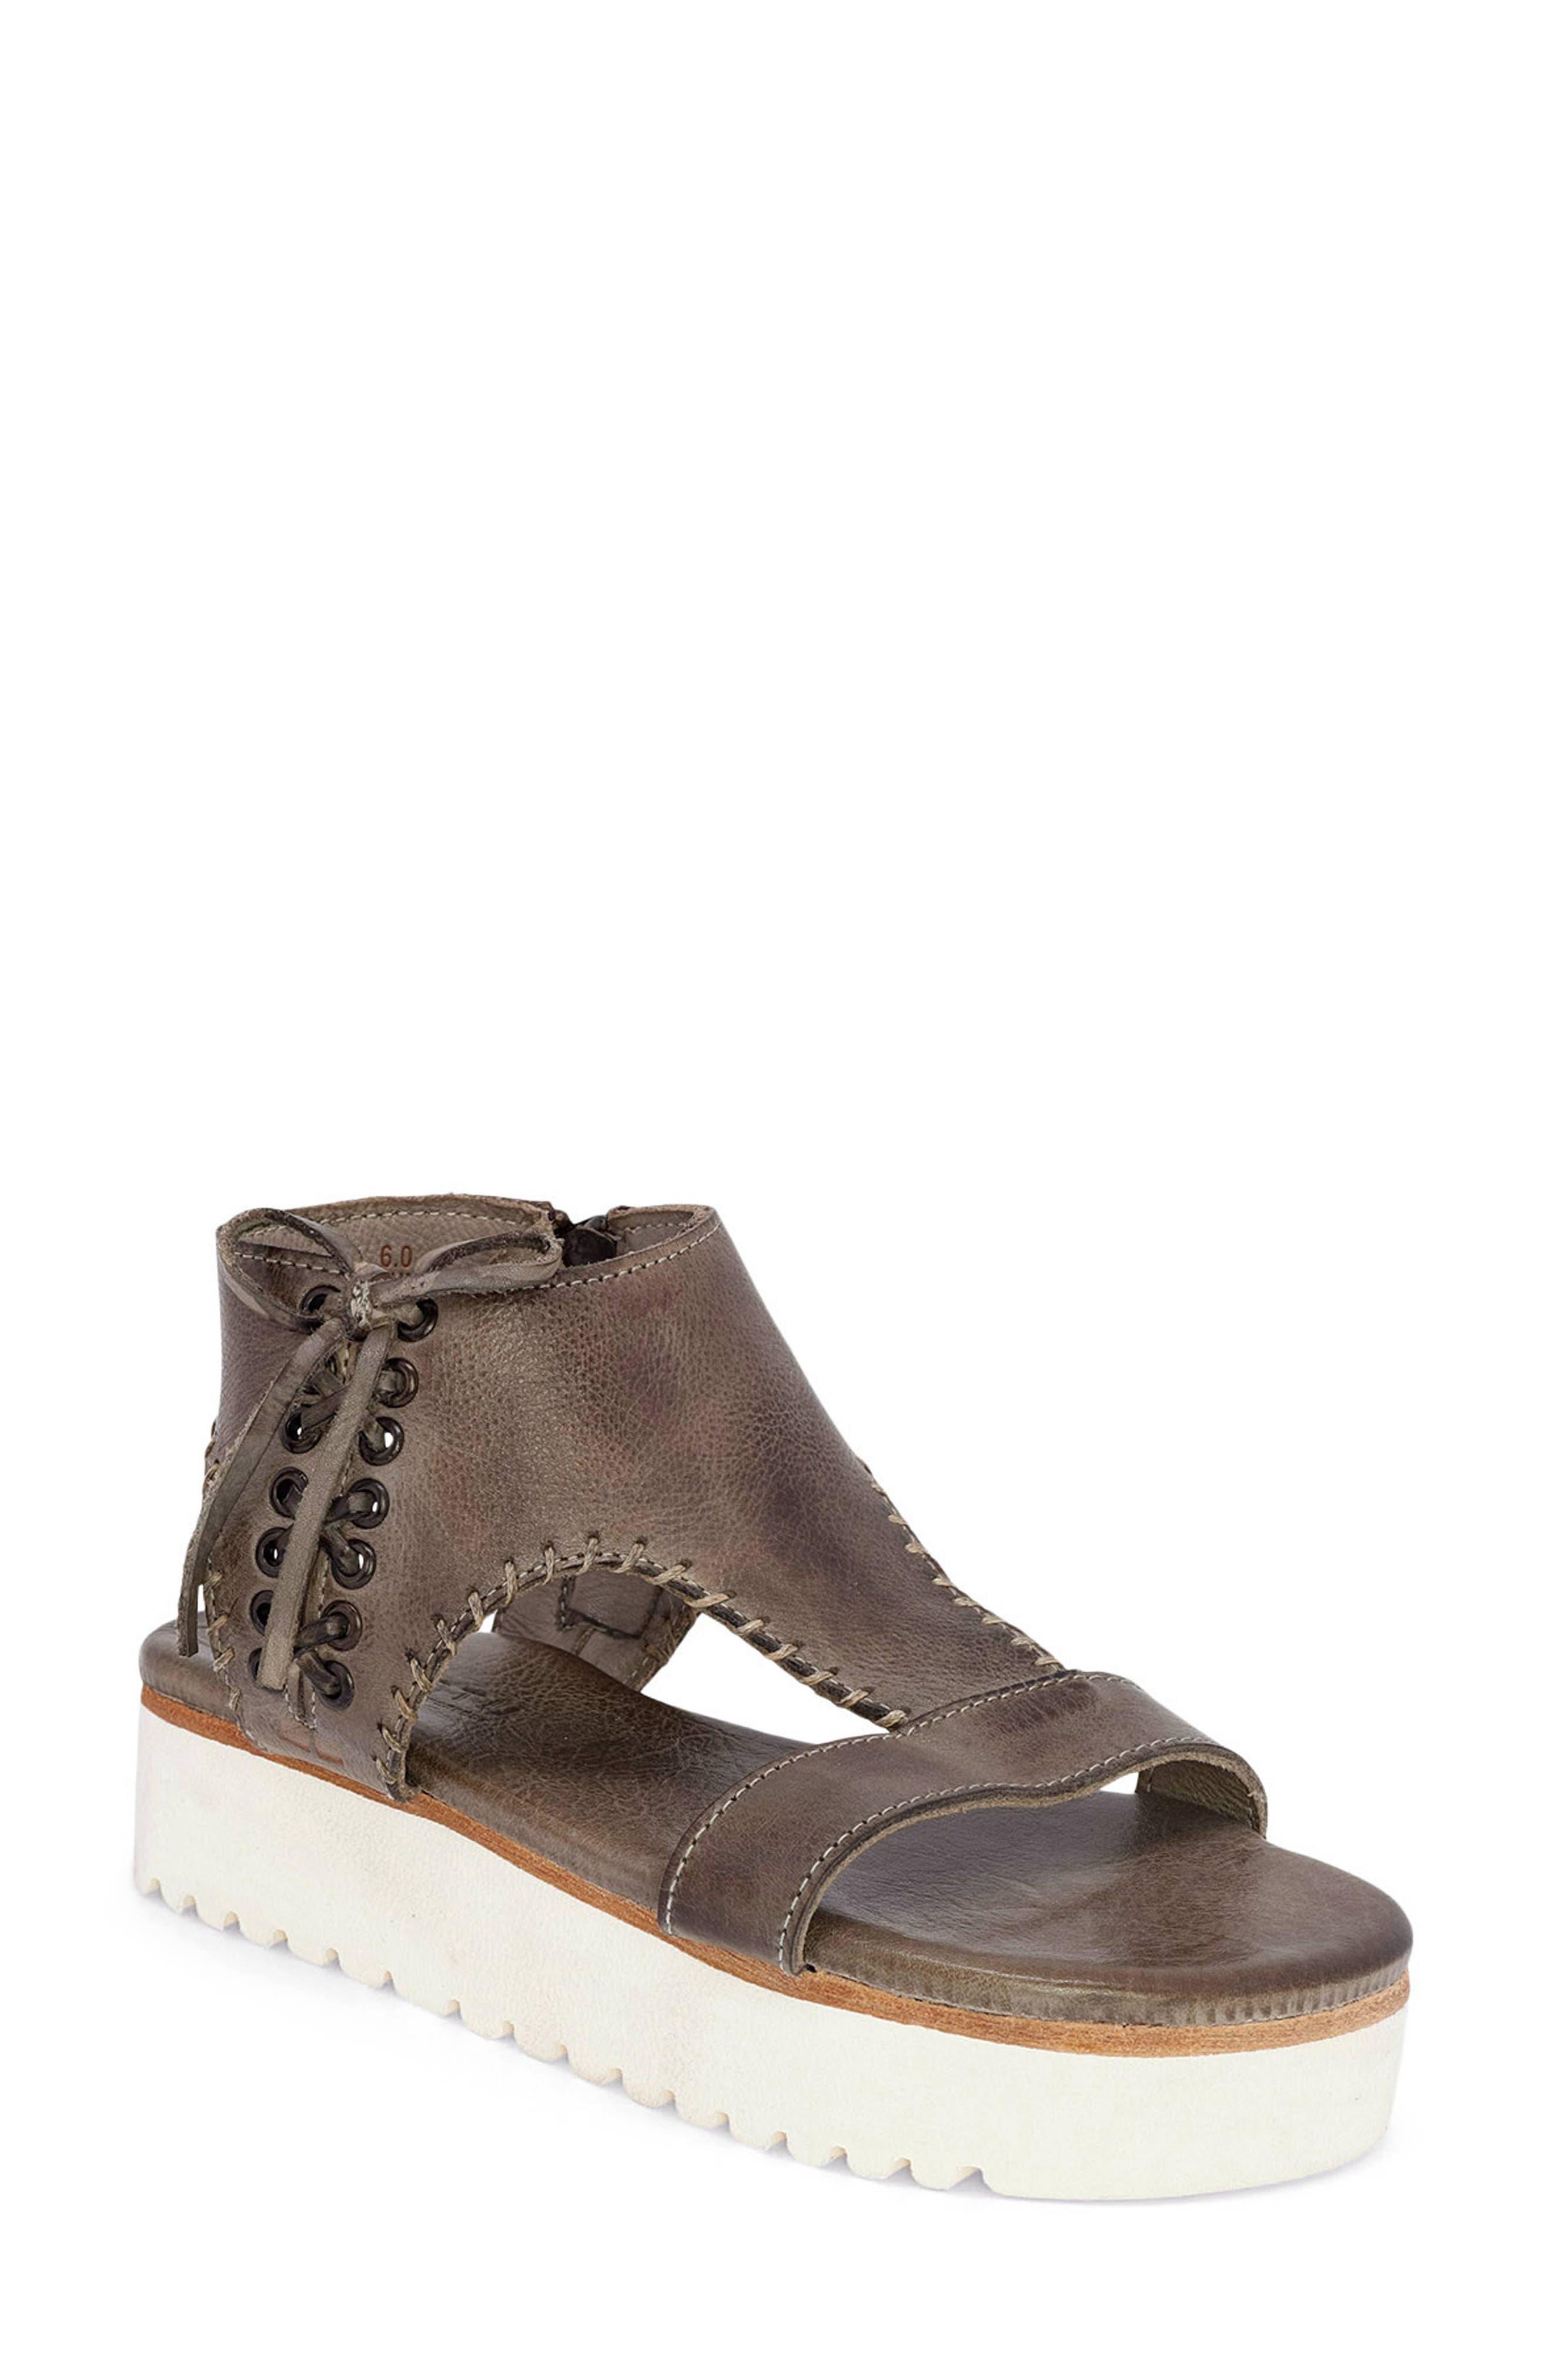 Zoe Platform Sandal